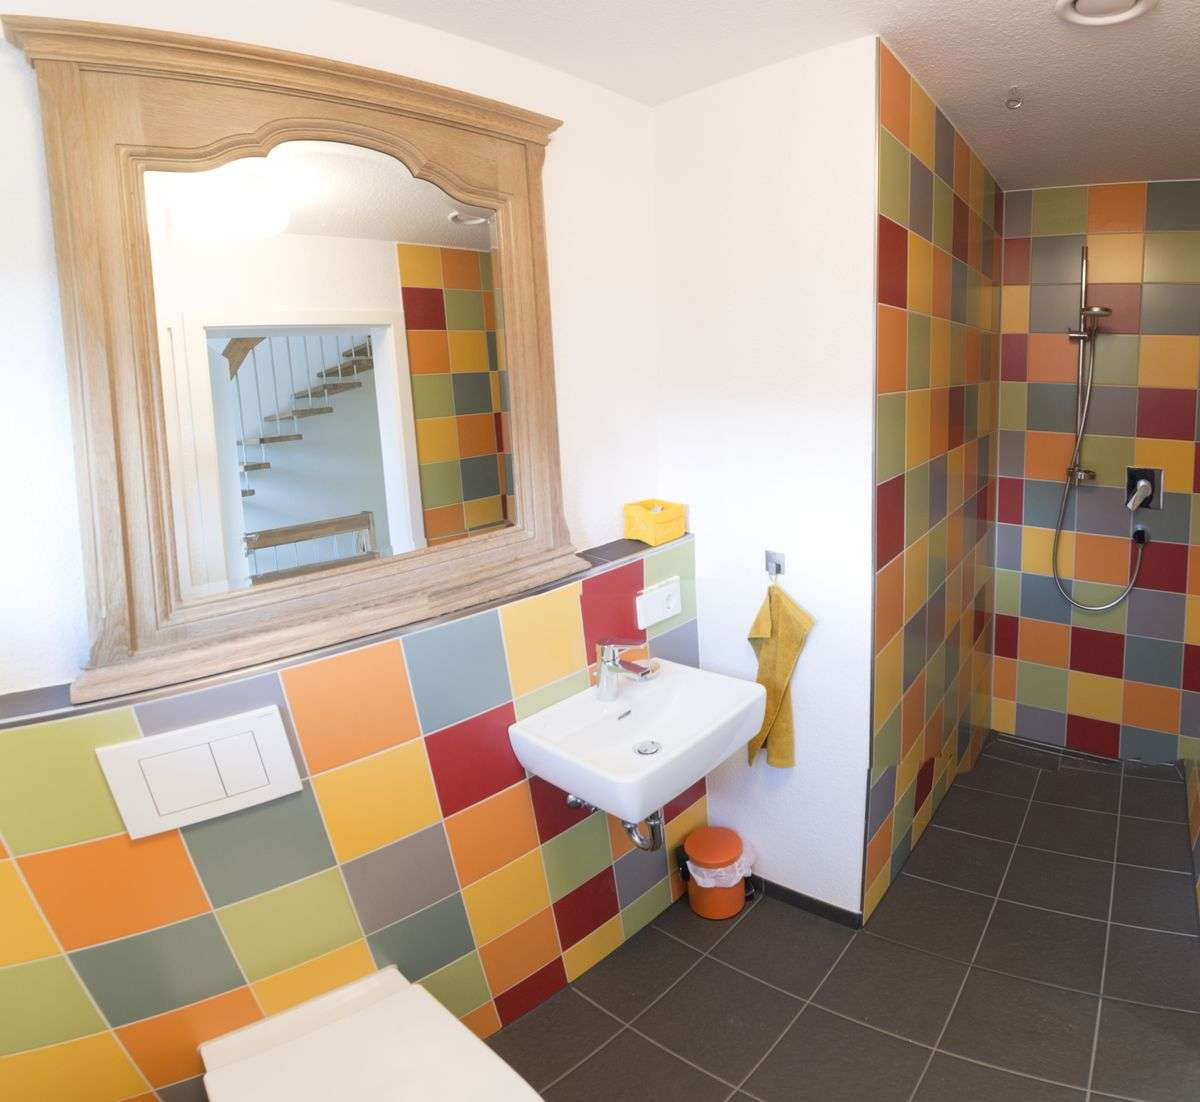 immobilienfotografie rewa aach bodensee wc rainer. Black Bedroom Furniture Sets. Home Design Ideas